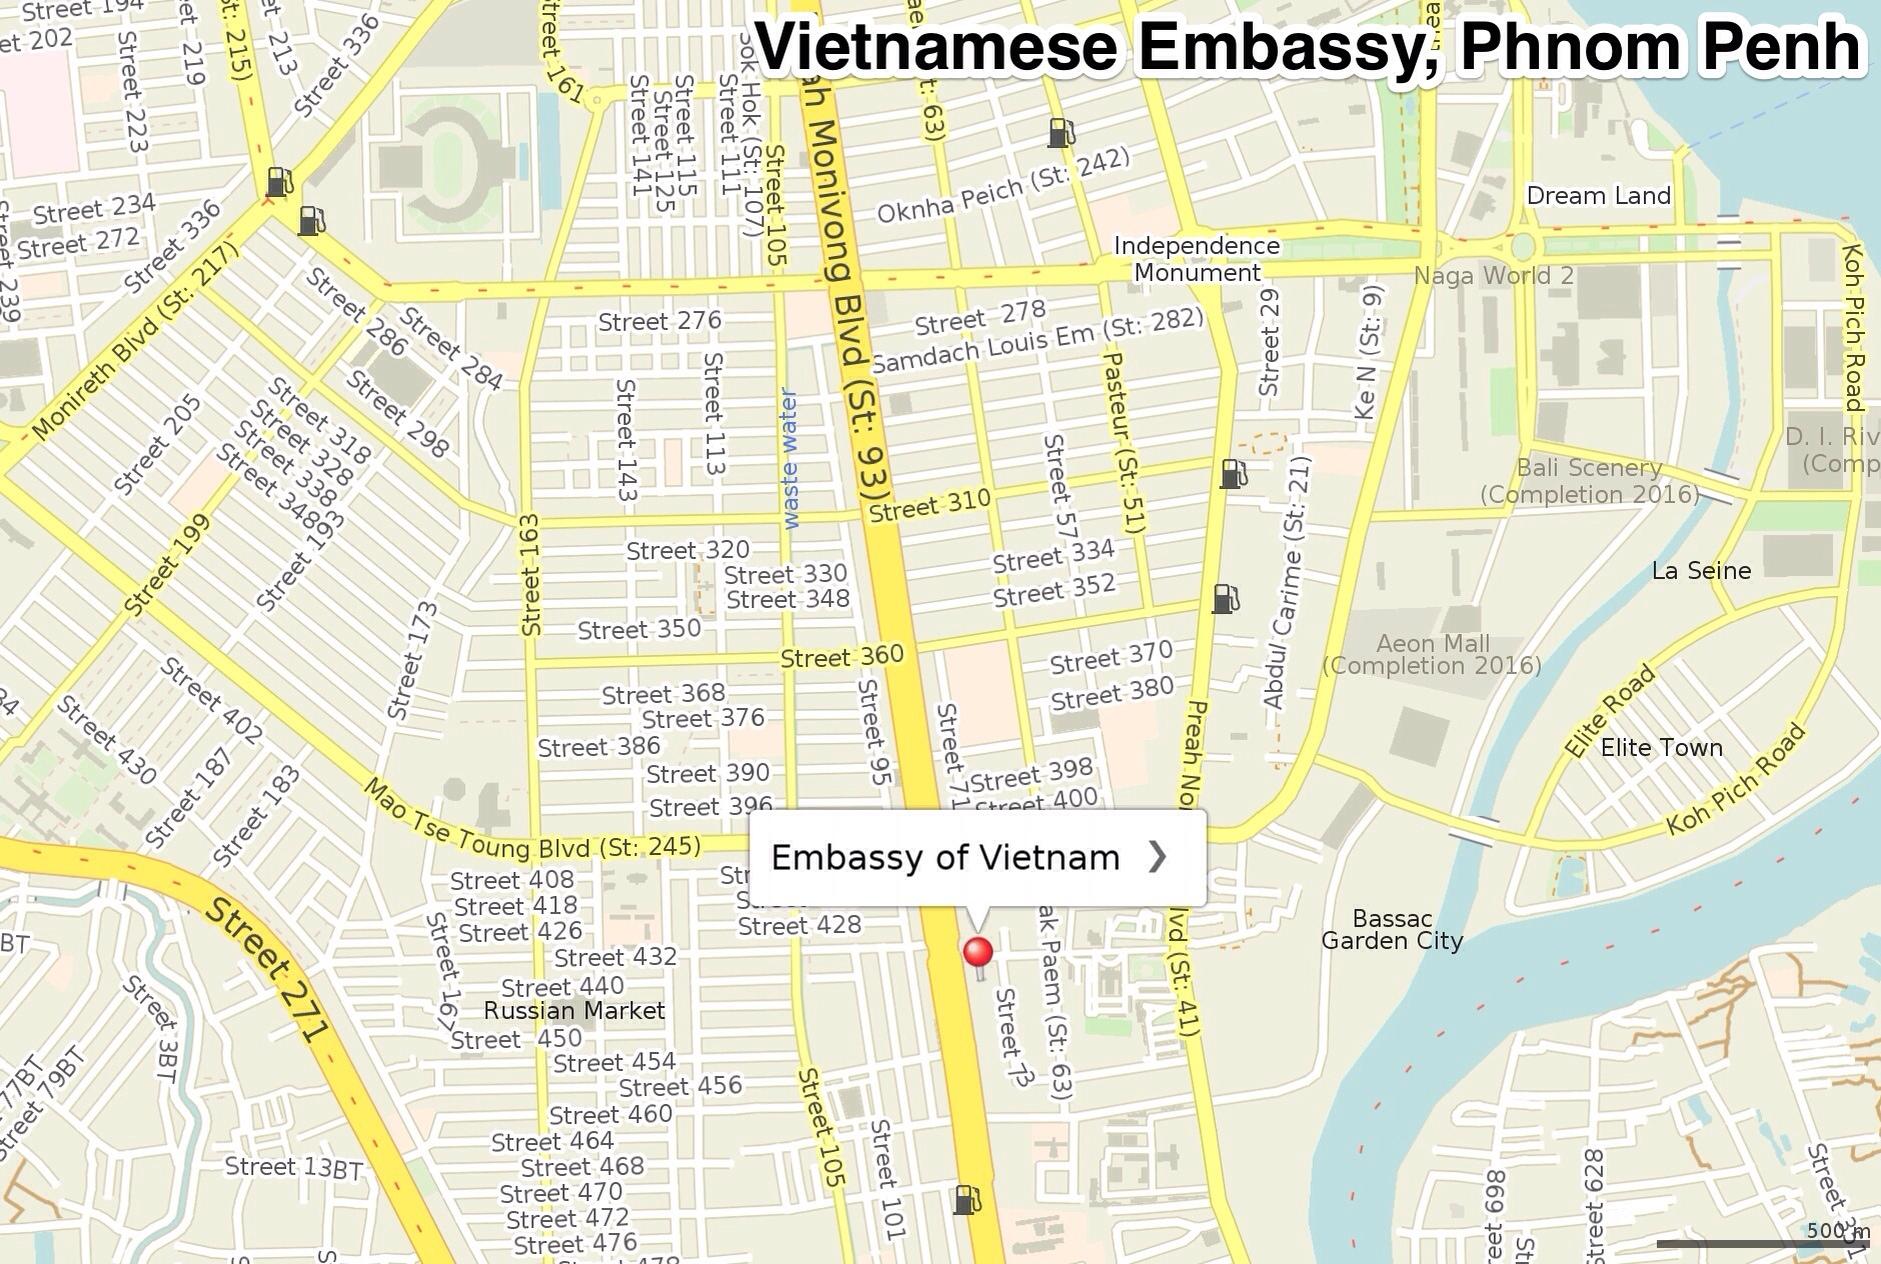 Vietnamese embassy map Phnom Penh